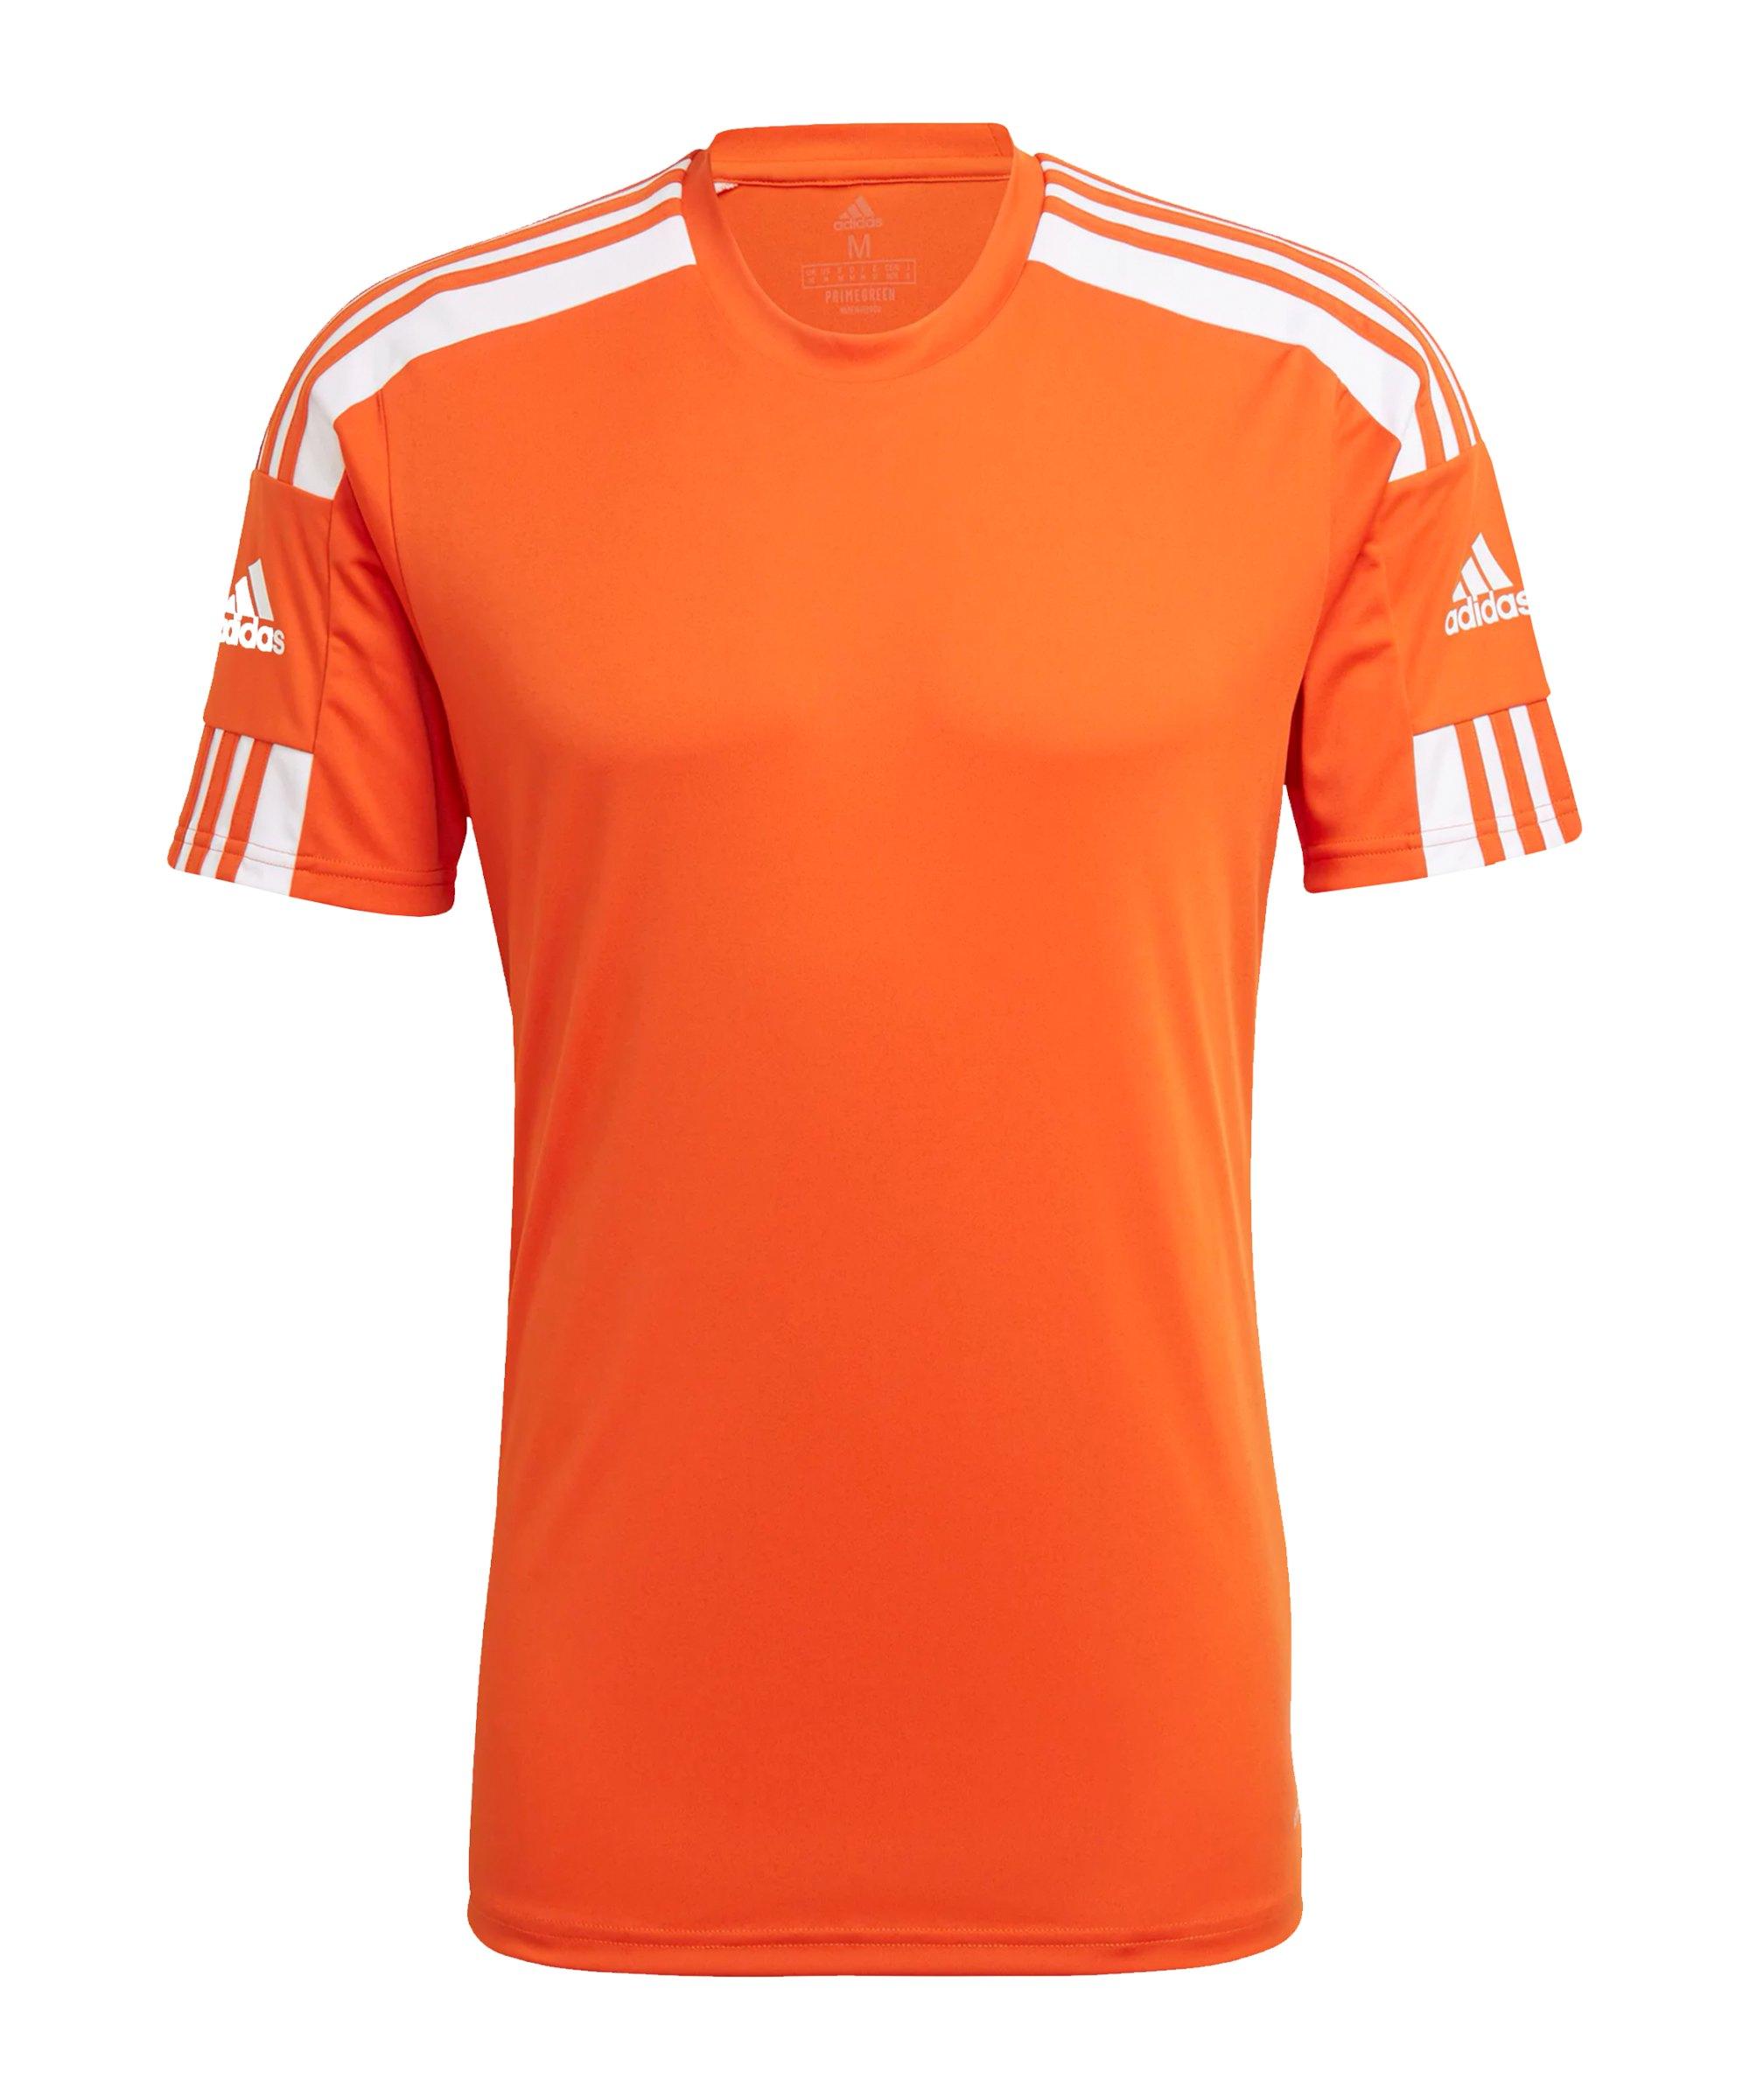 adidas Squadra 21 Trikot Orange Weiss - orange